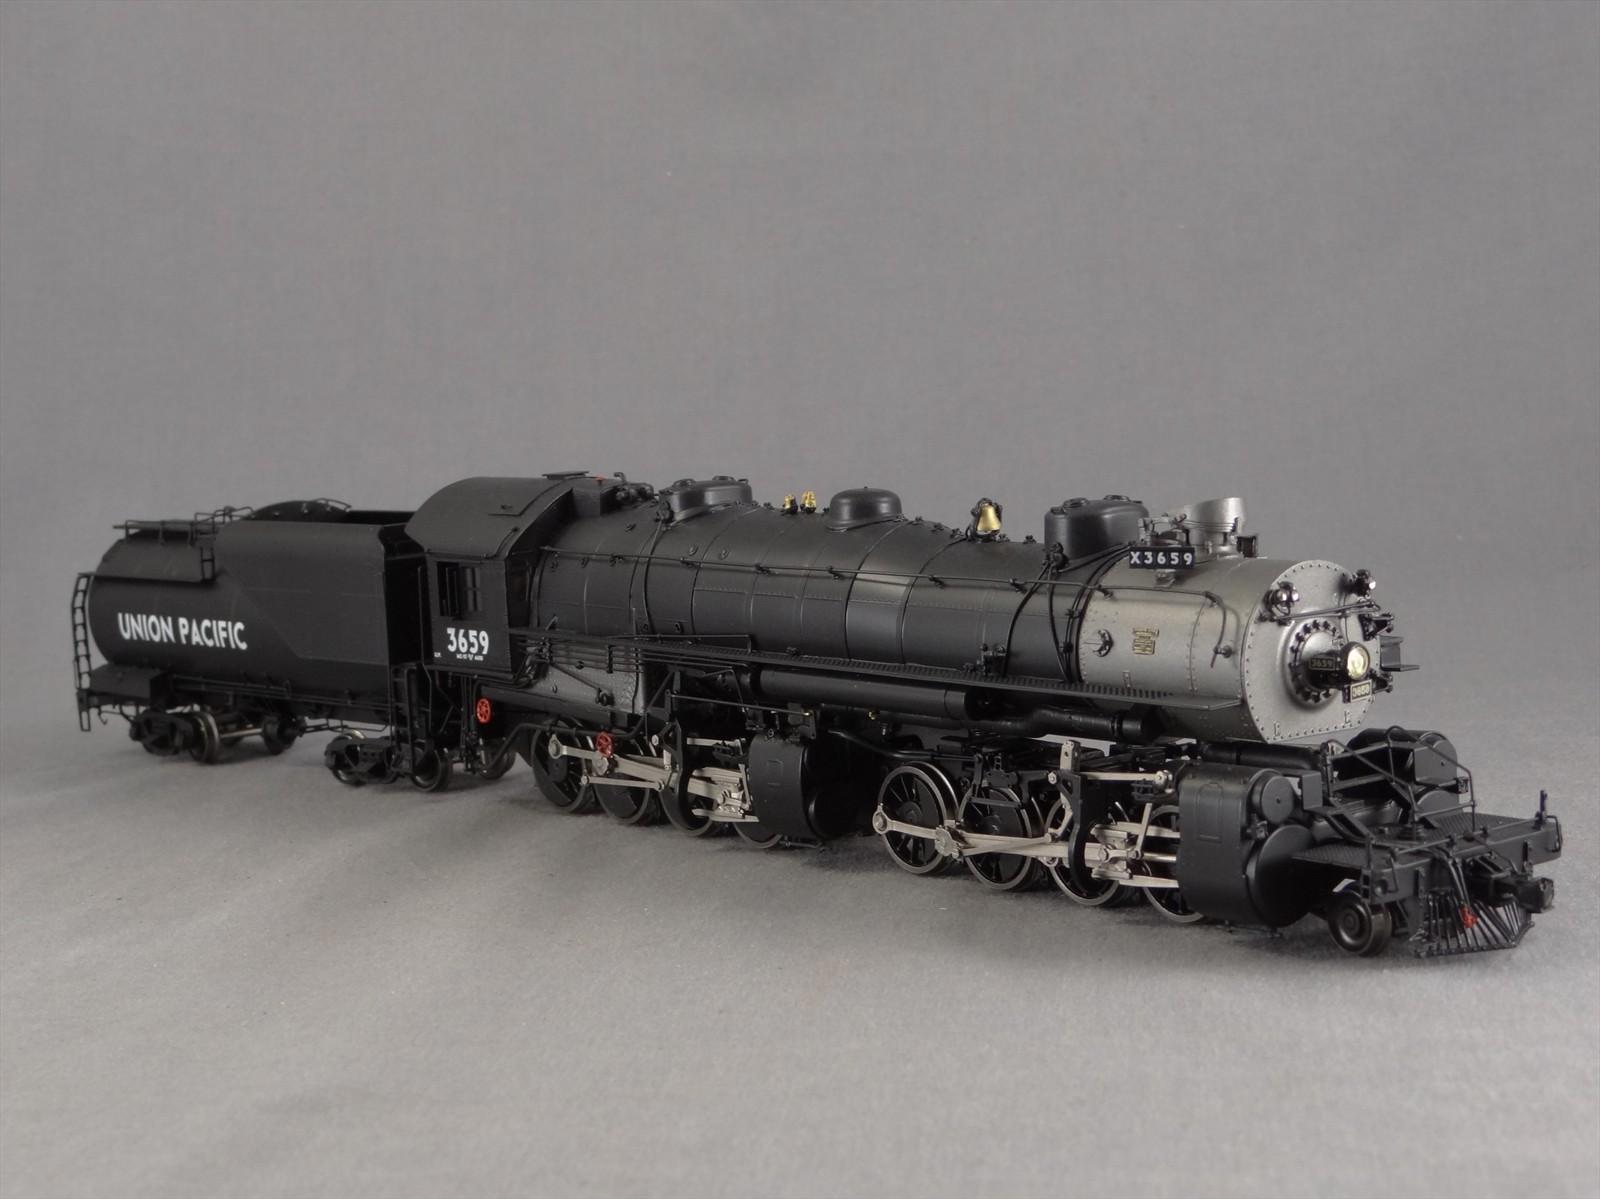 Overland 4539.1 - MC-6, 2-8-8-0 'Bull Moose', Union Pacific Nr.3659, 98-99 release.01